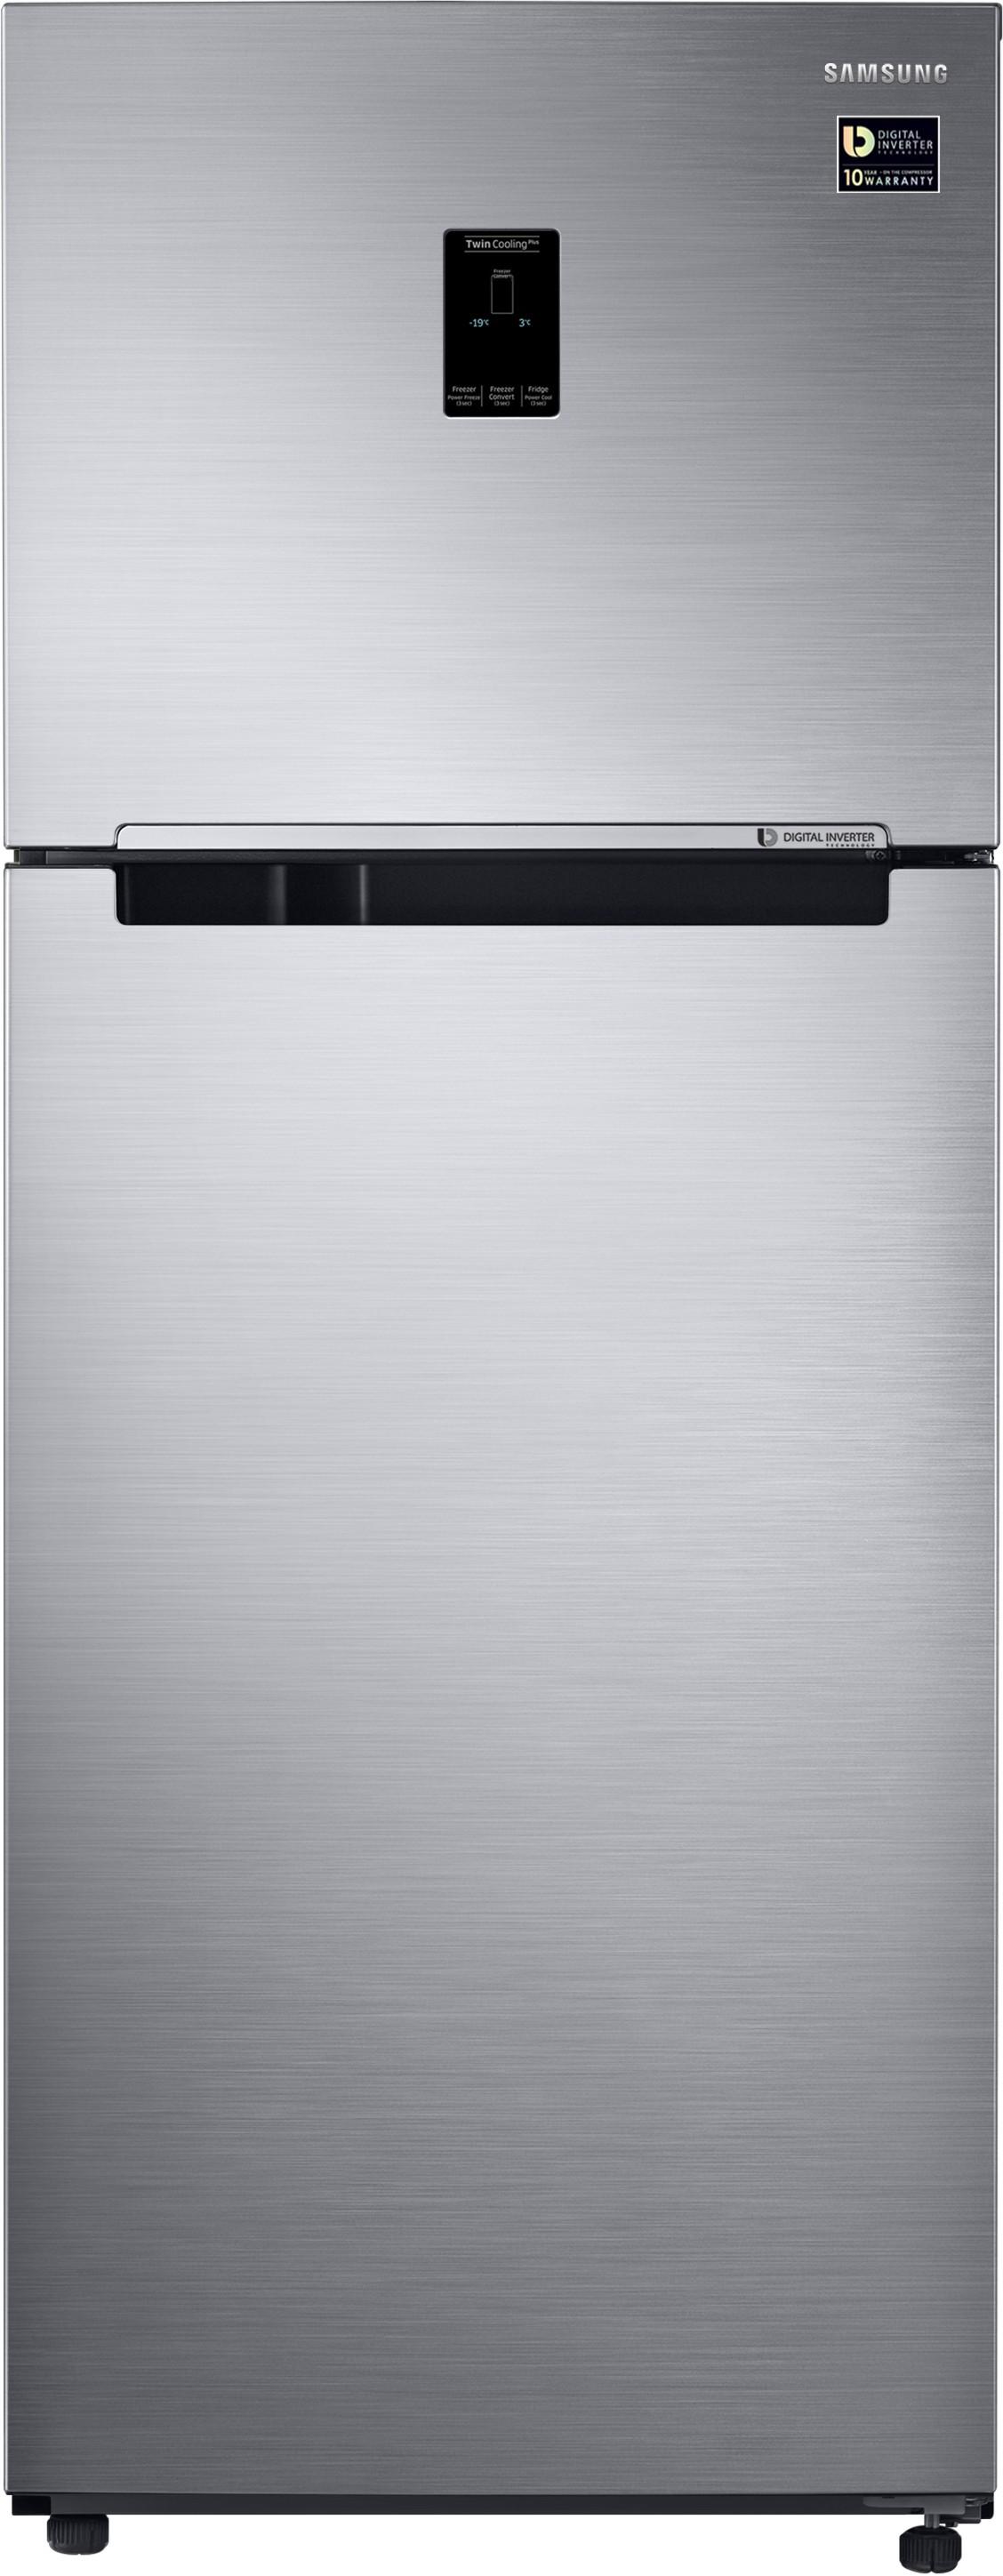 SAMSUNG 394 L Frost Free Double Door Refrigerator(RT39M5538S9/TL, Refined Inox, 2017) (Samsung) Tamil Nadu Buy Online